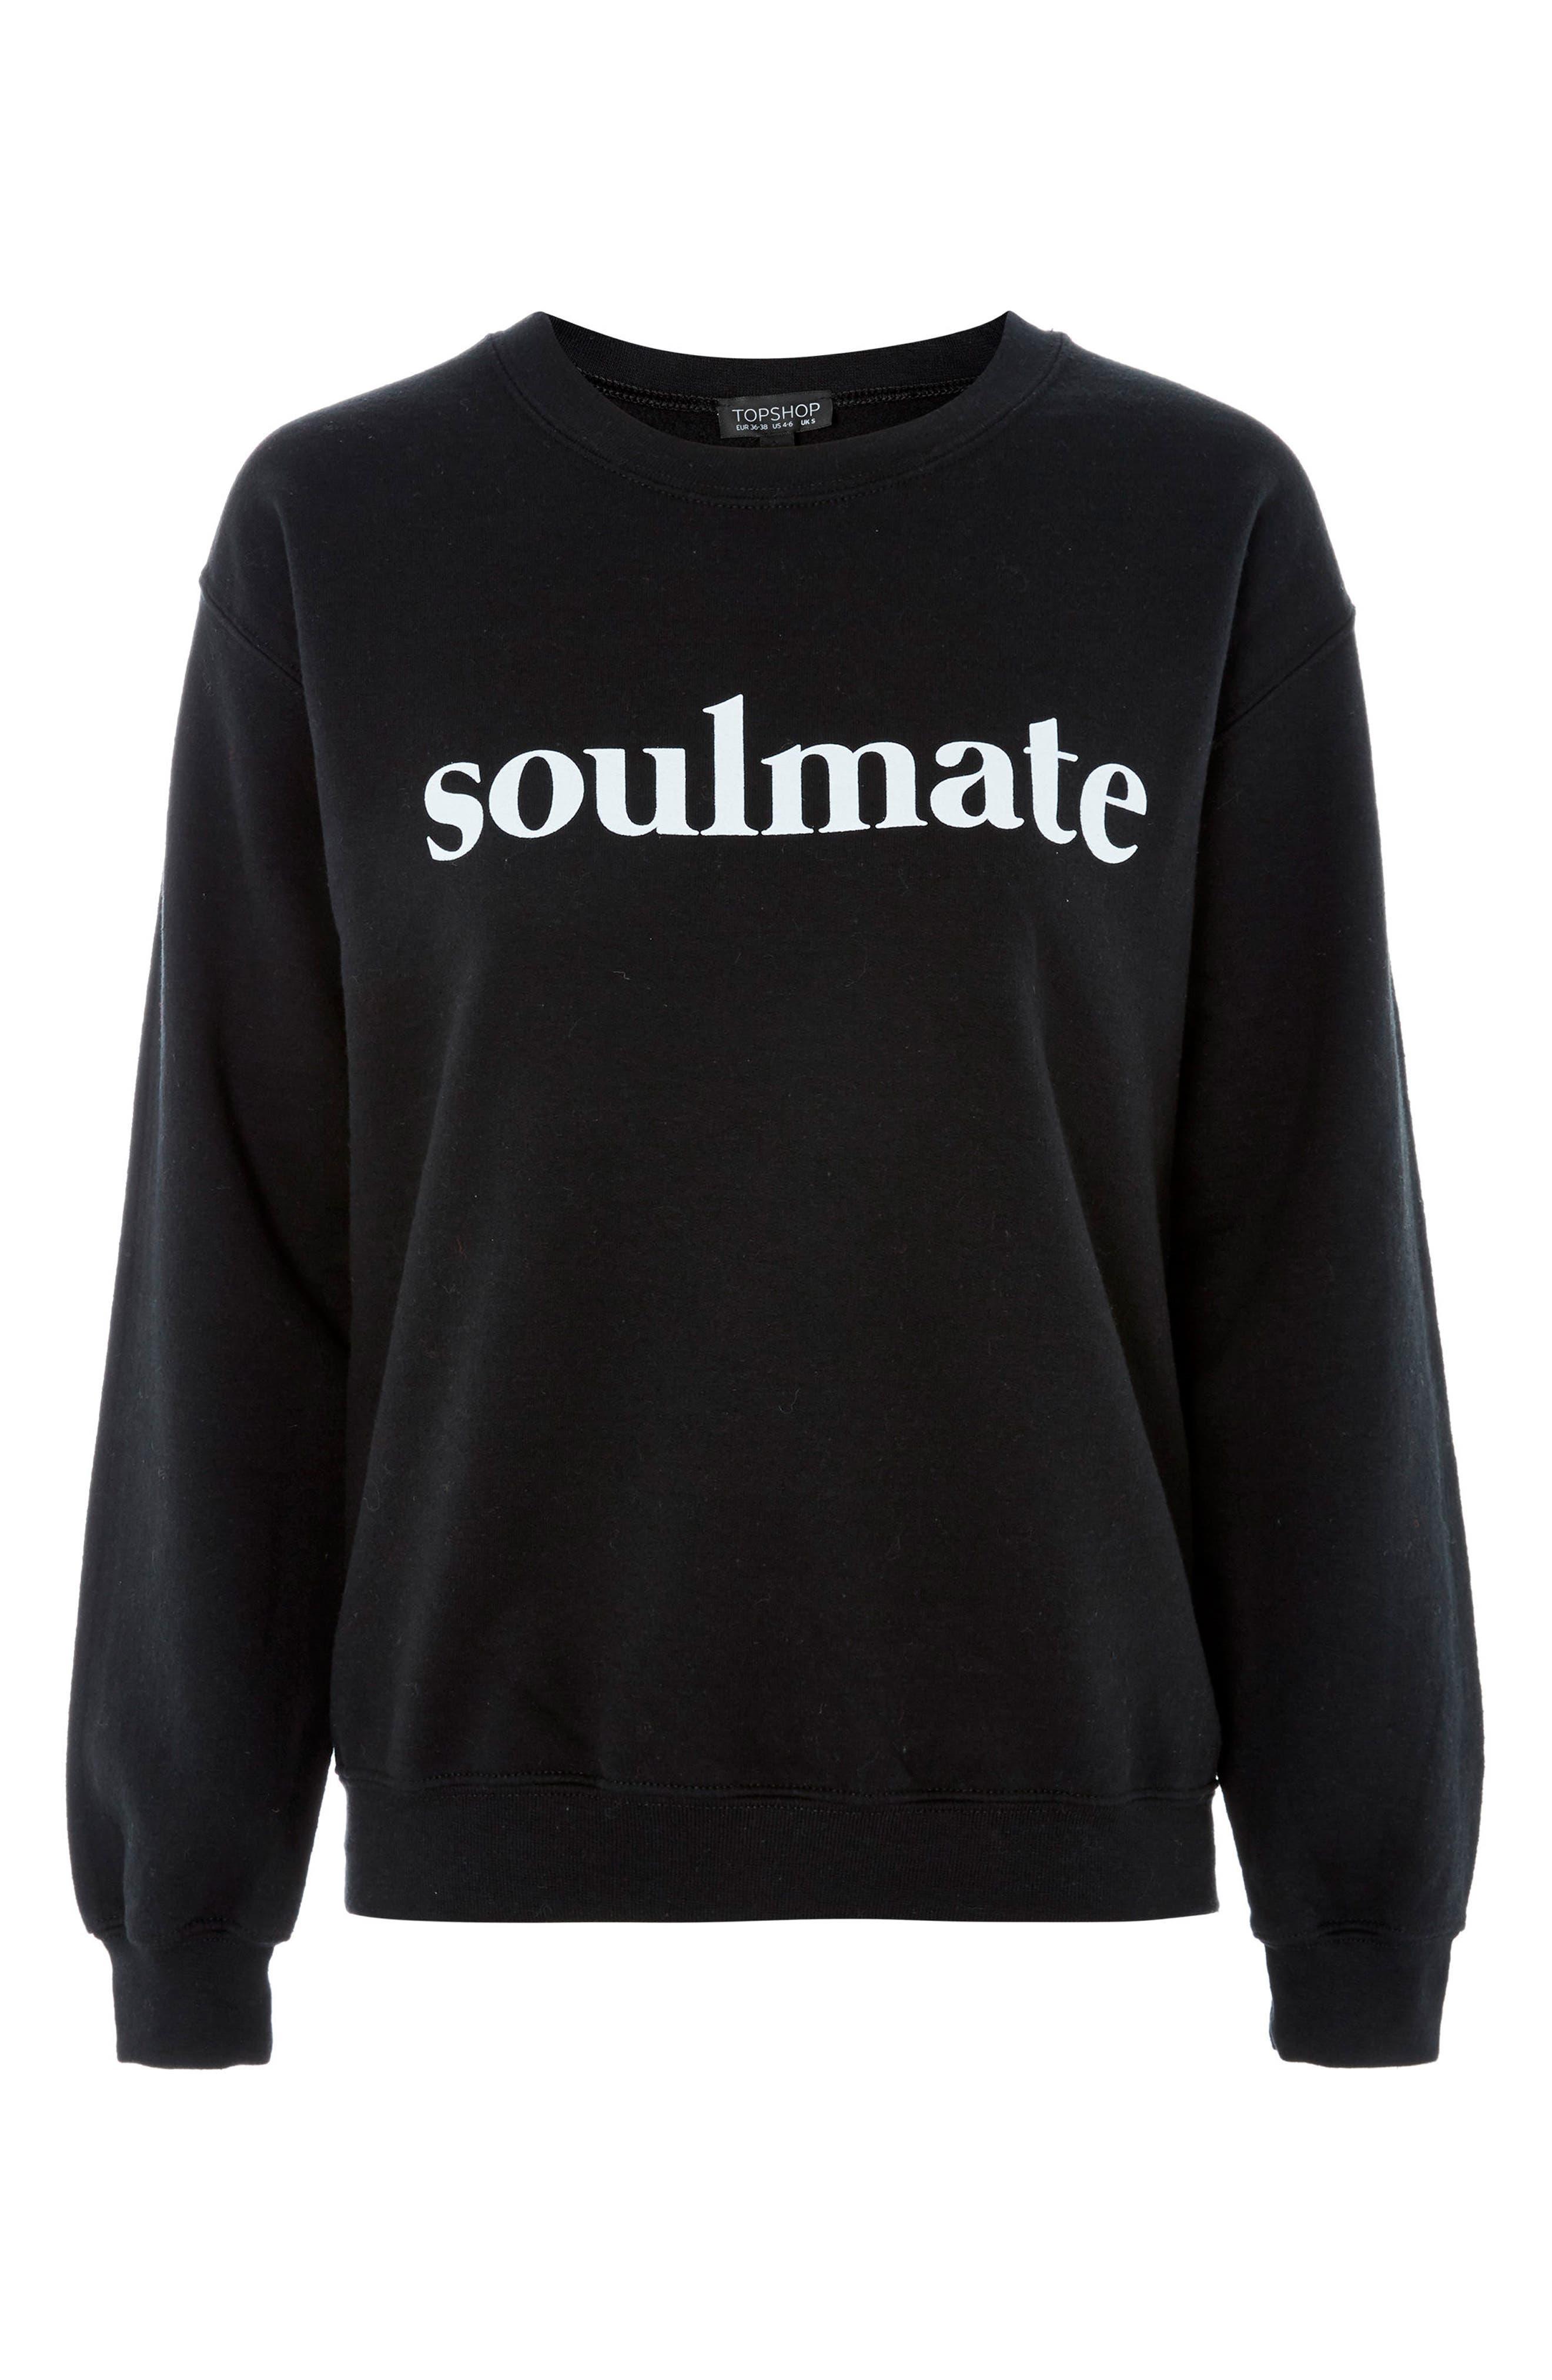 Main Image - Topshop Soulmate Graphic Sweatshirt